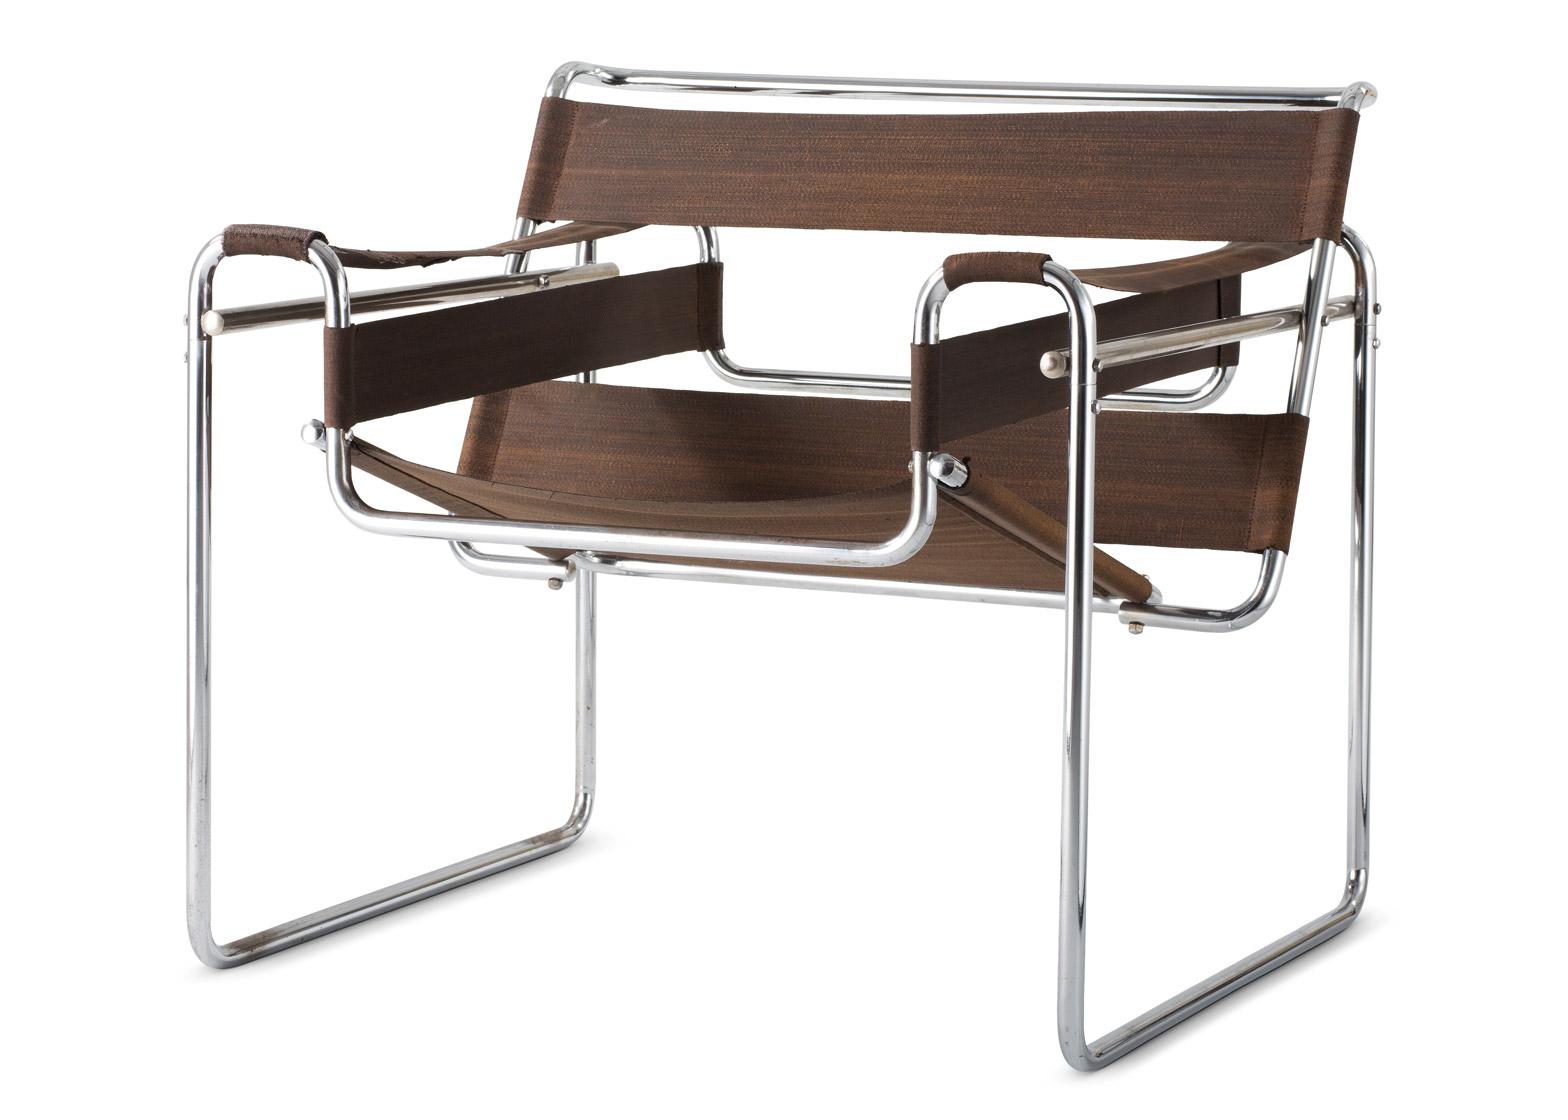 ... Bauhaus retrospective at Vitra Design Museum  sc 1 st  Dezeen & Vitra Design Museum hosts major Bauhaus retrospective